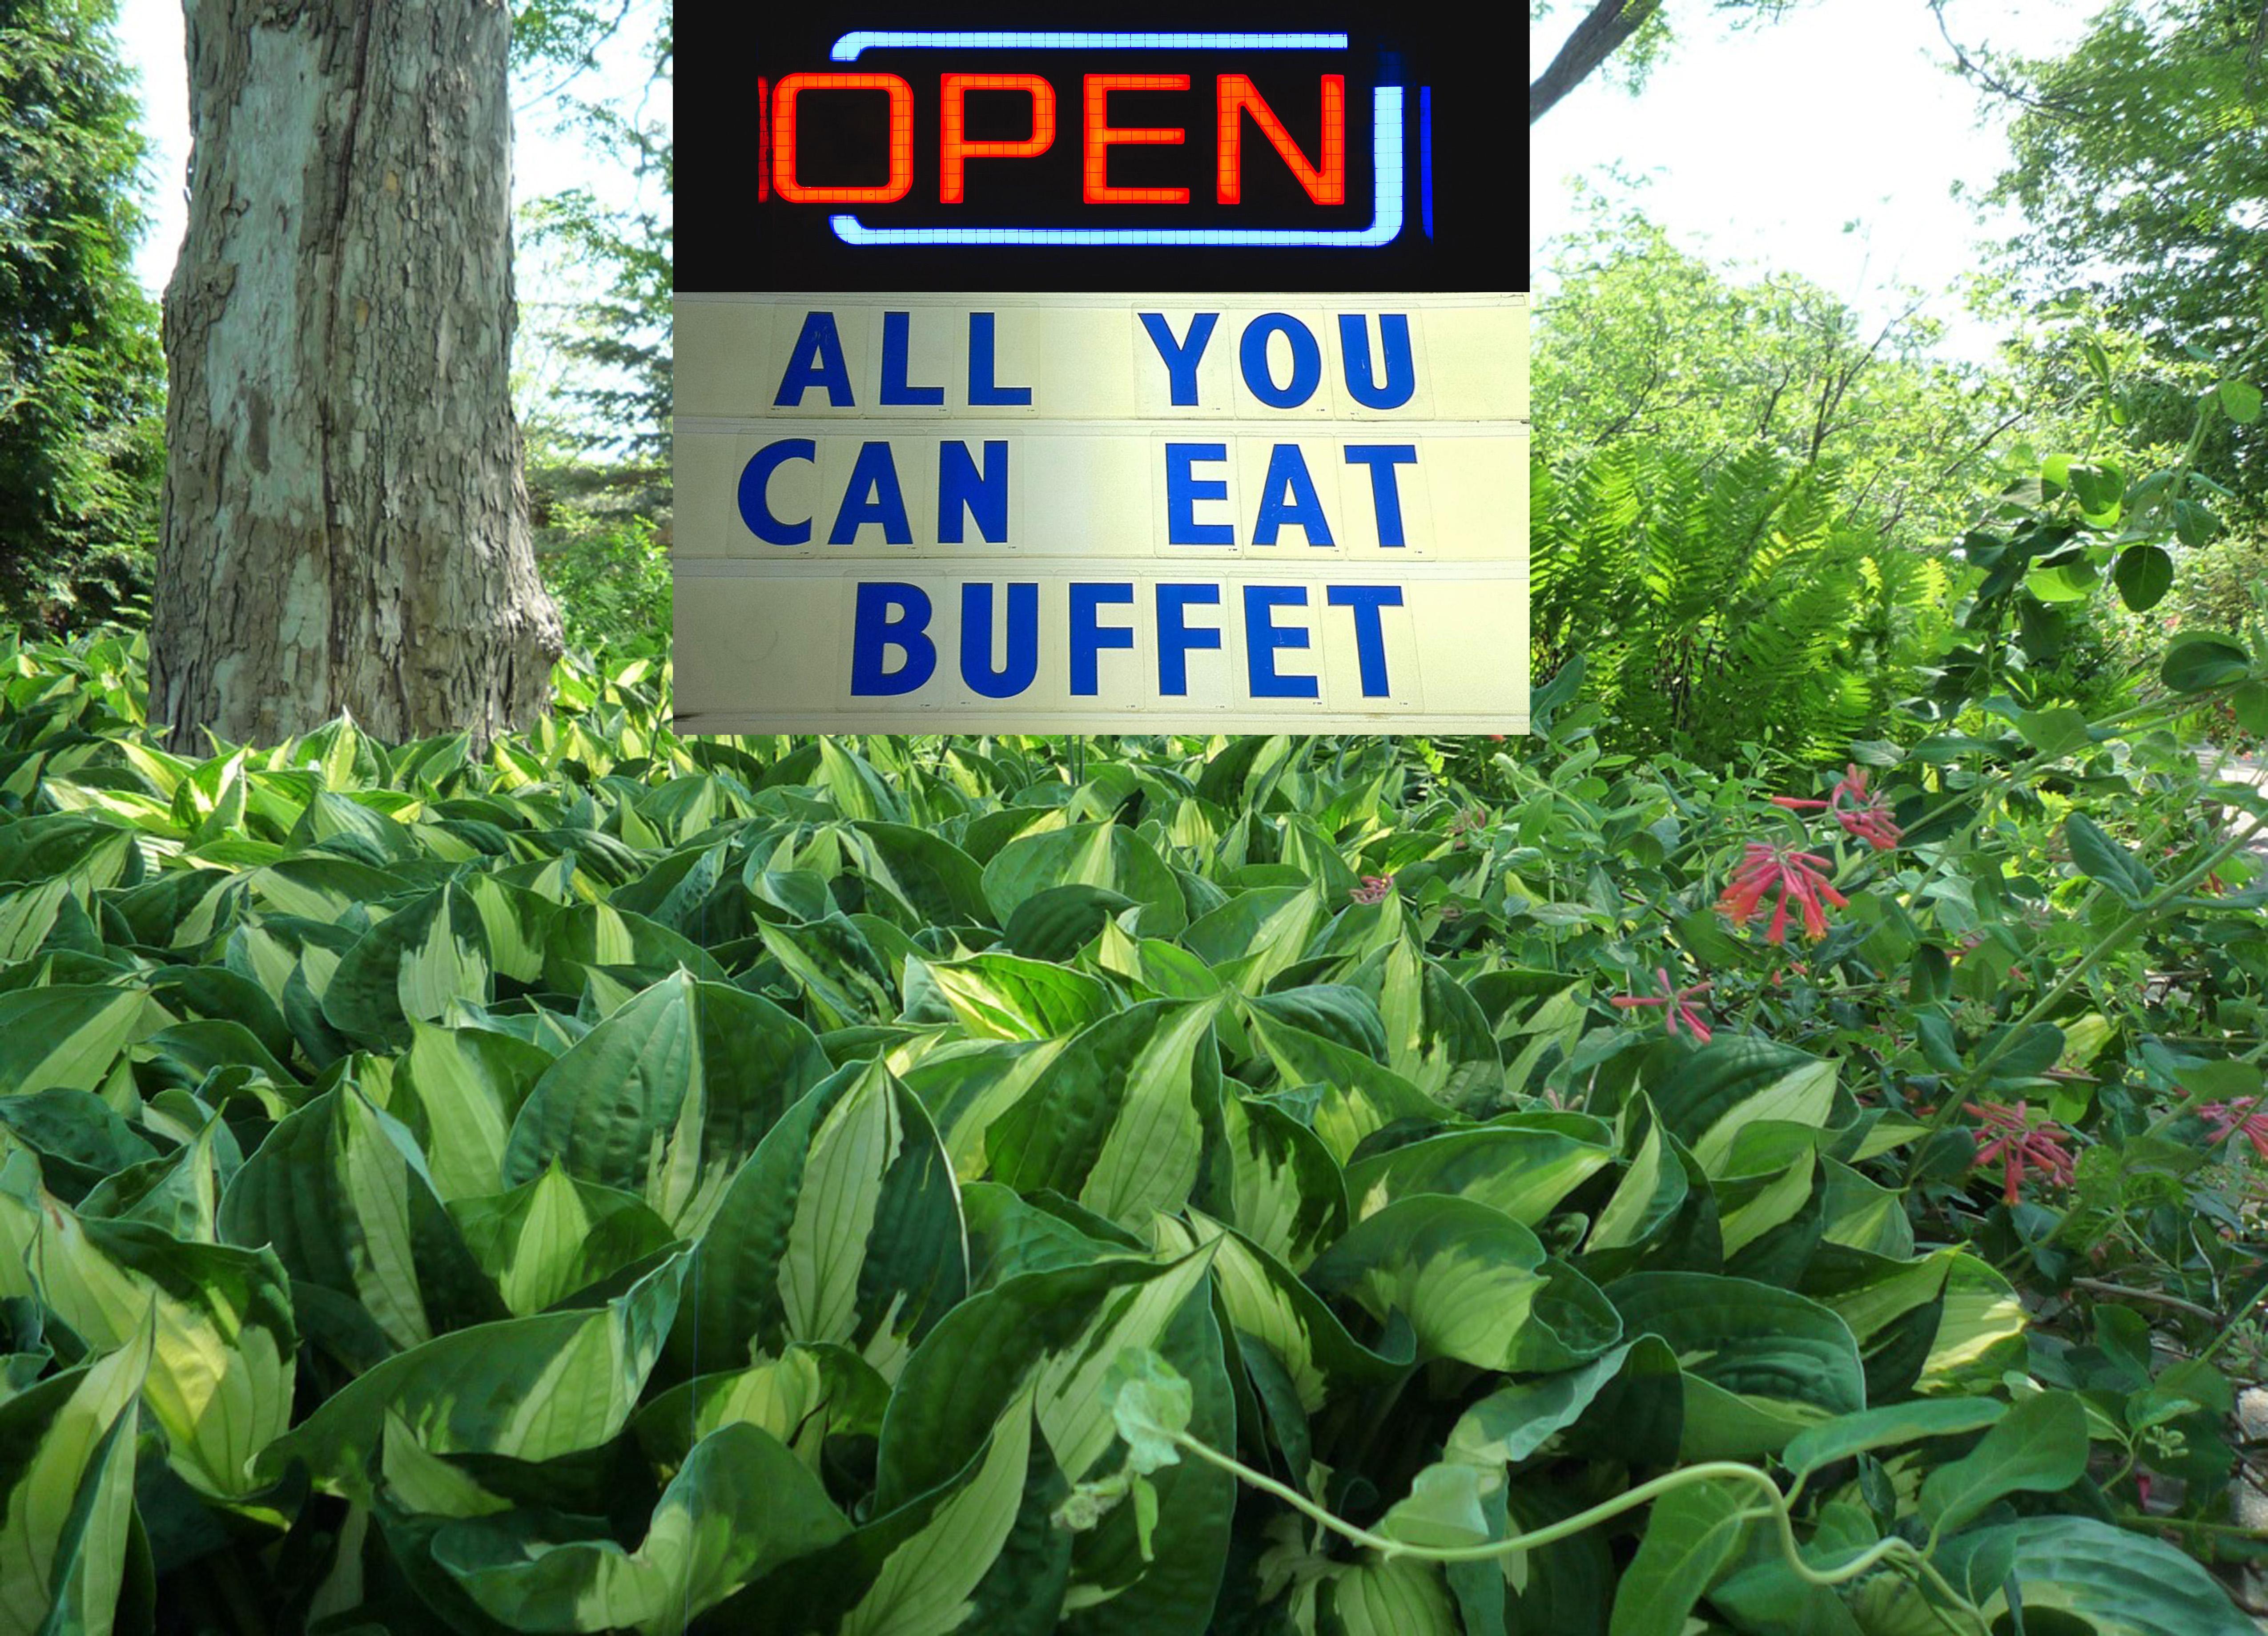 A well landscaped yard can become a deer buffet.